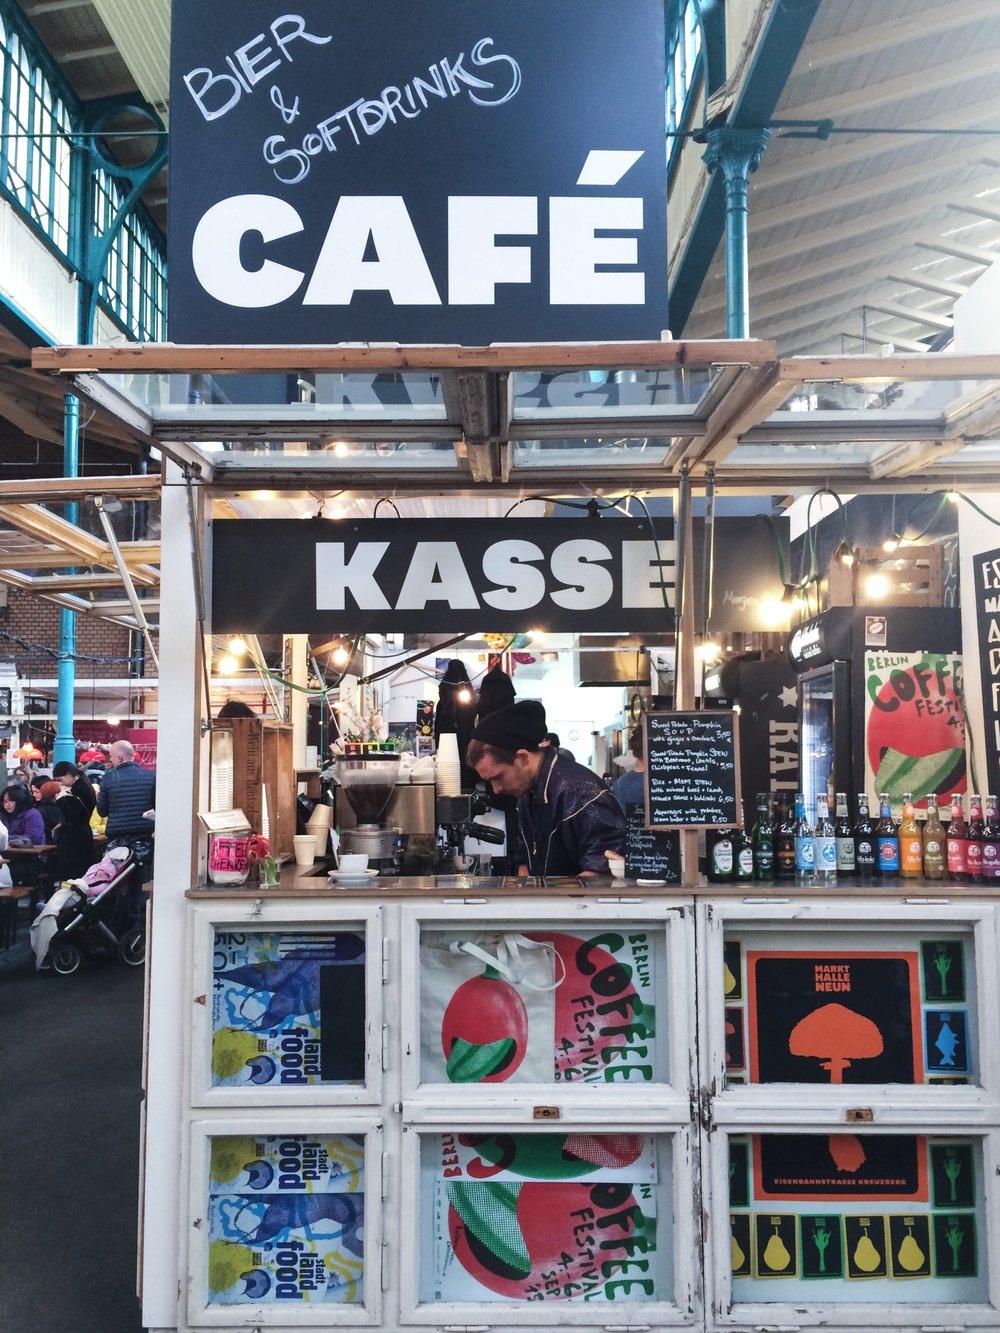 Markethalle Neun / Friedrichshain-Kreuzberg, Berlin / Germany